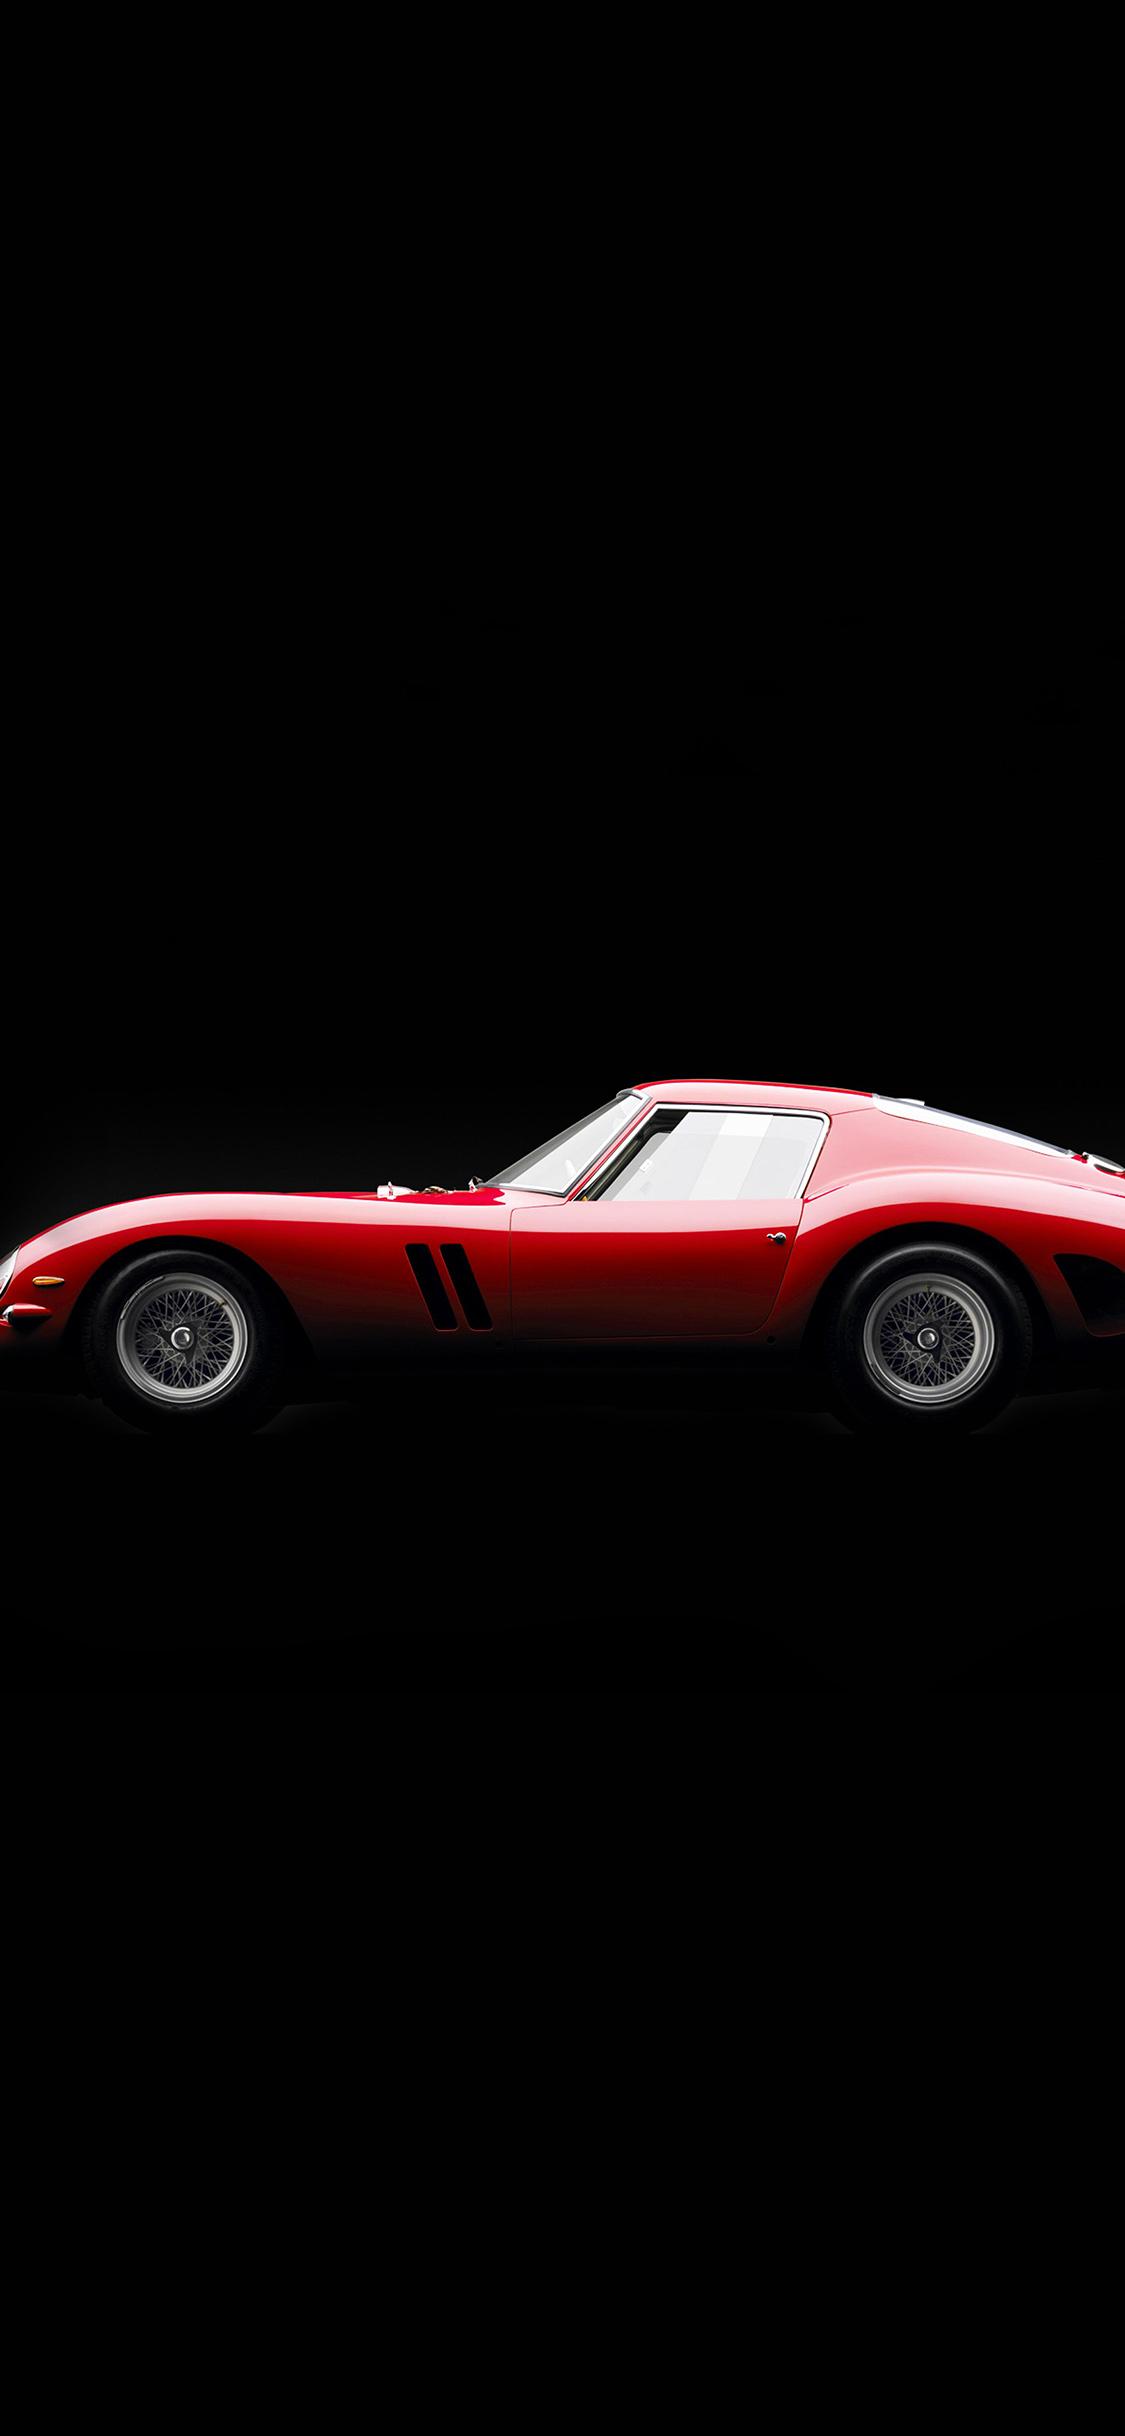 Image Result For Mac Wallpaper Ferrari  Gto Model